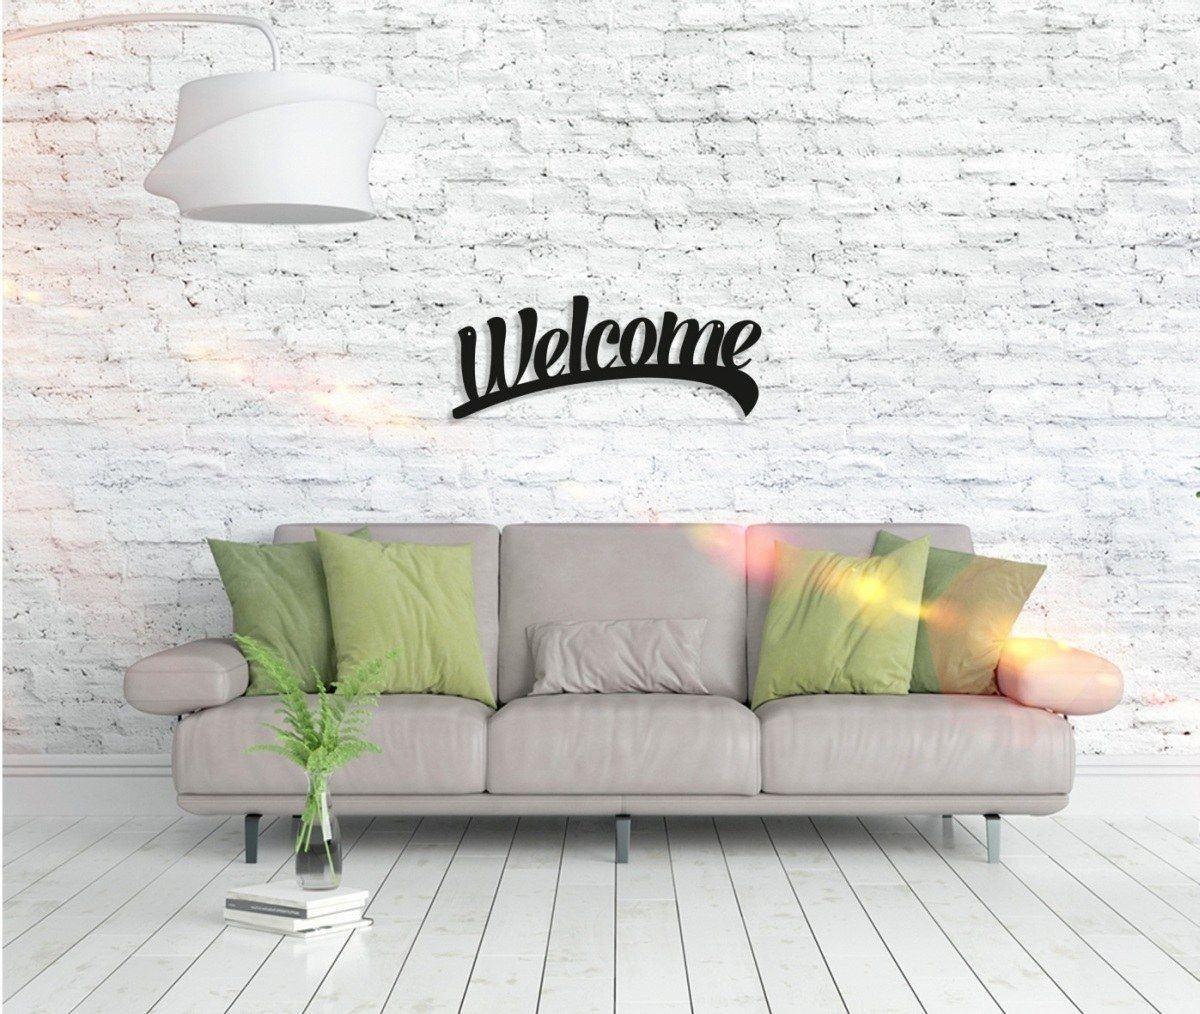 Metall Wandbild - Welcome